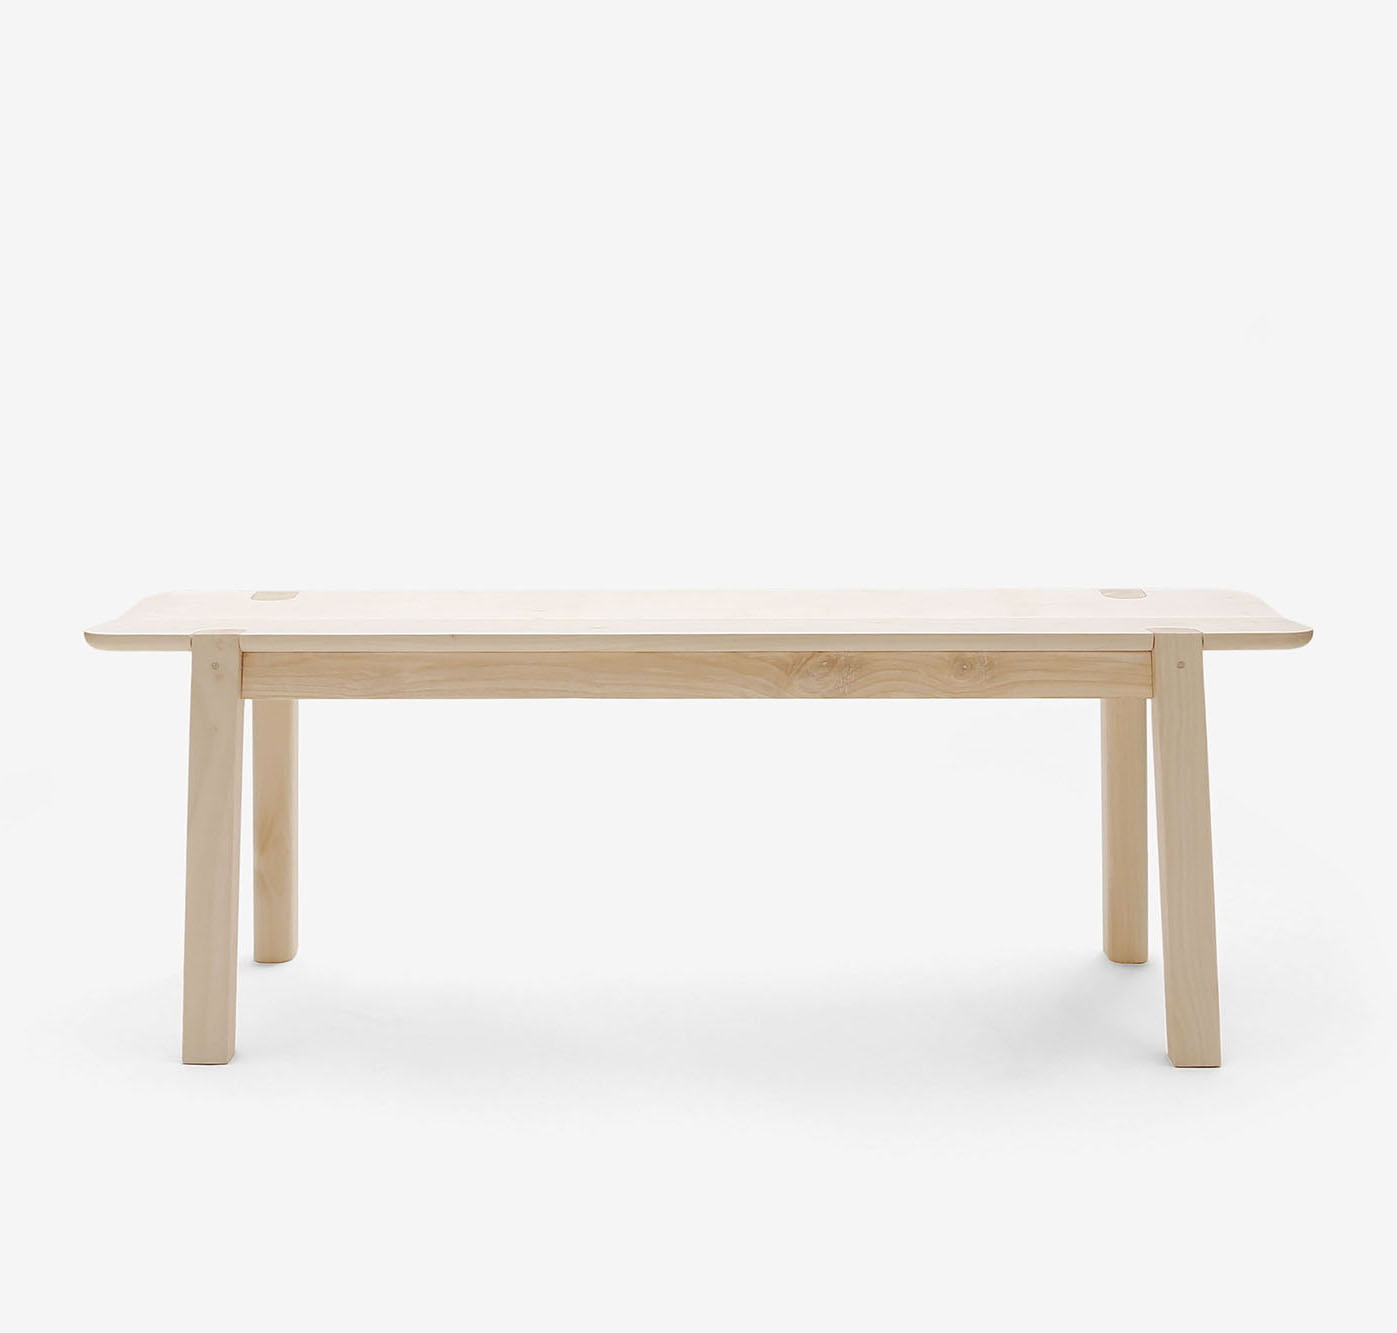 3furn_bench_side_bøøt